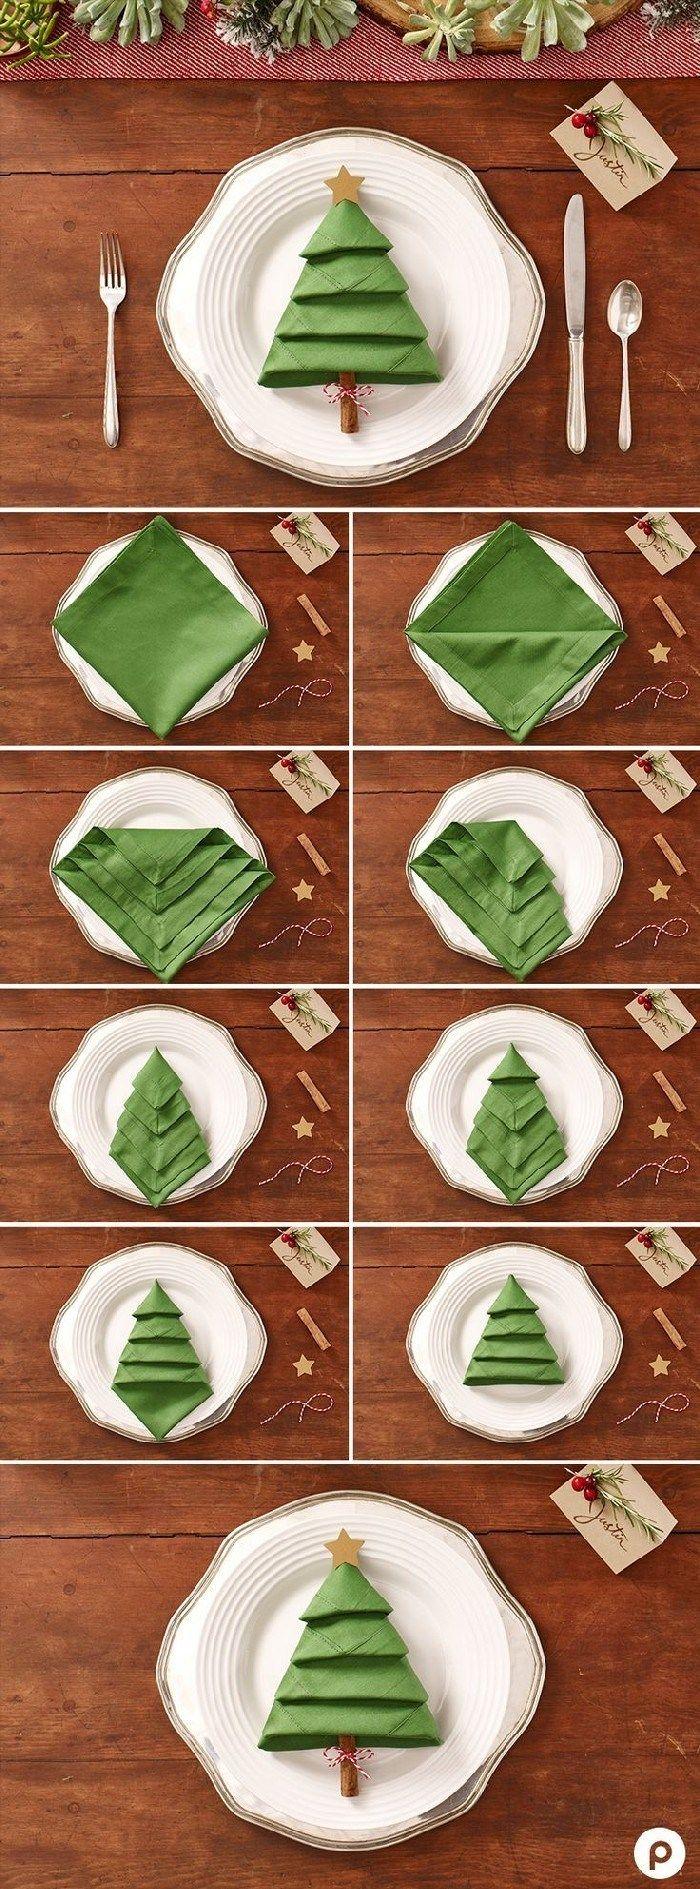 Awesome DIY Napkin Folding Tutorial Ideas 7 #napkinfoldingideas